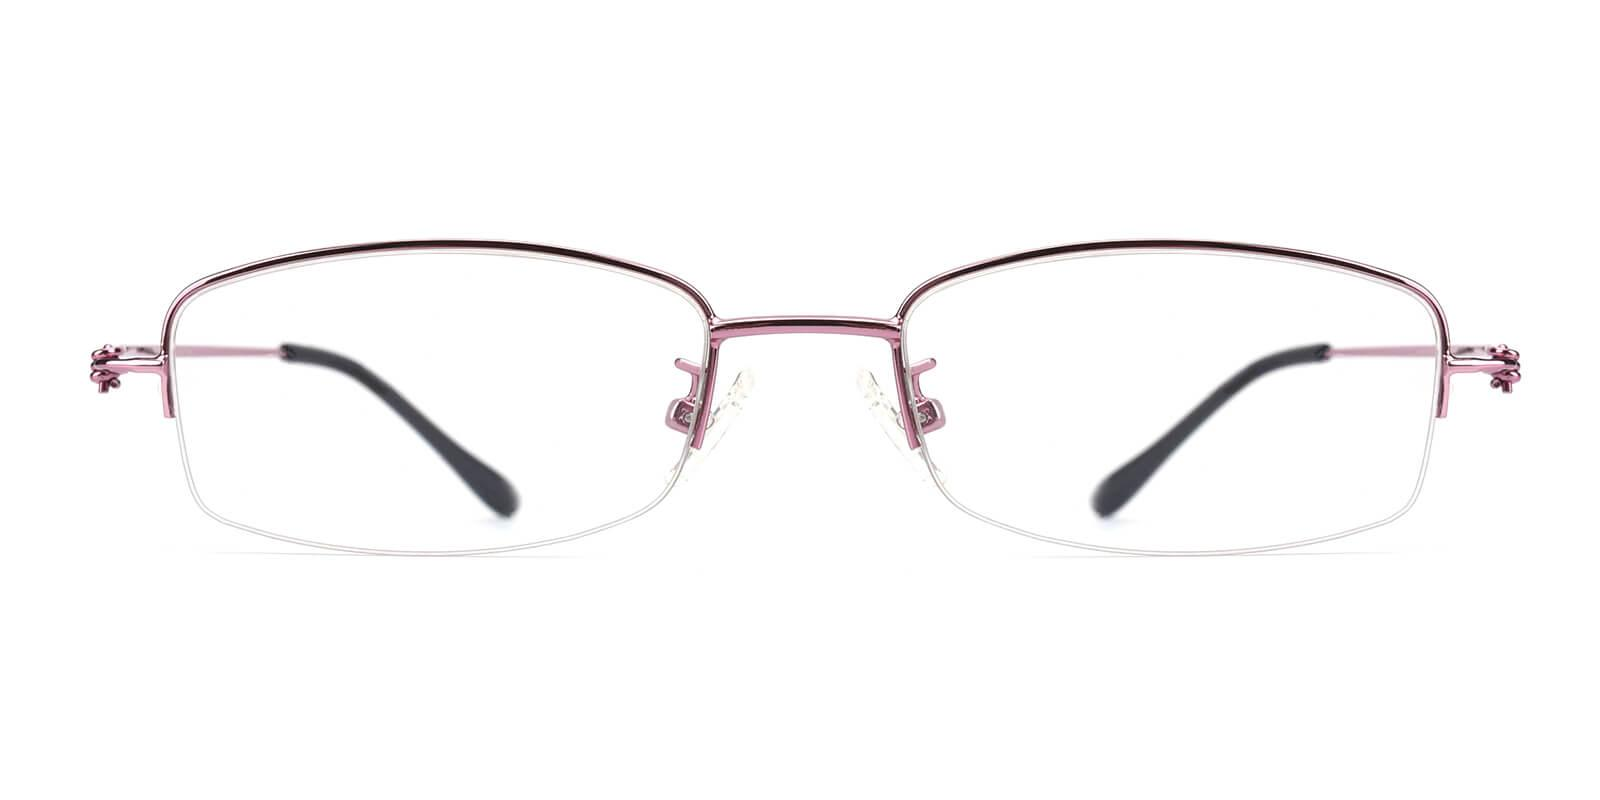 Elise-Pink-Rectangle-Metal-Eyeglasses-additional2